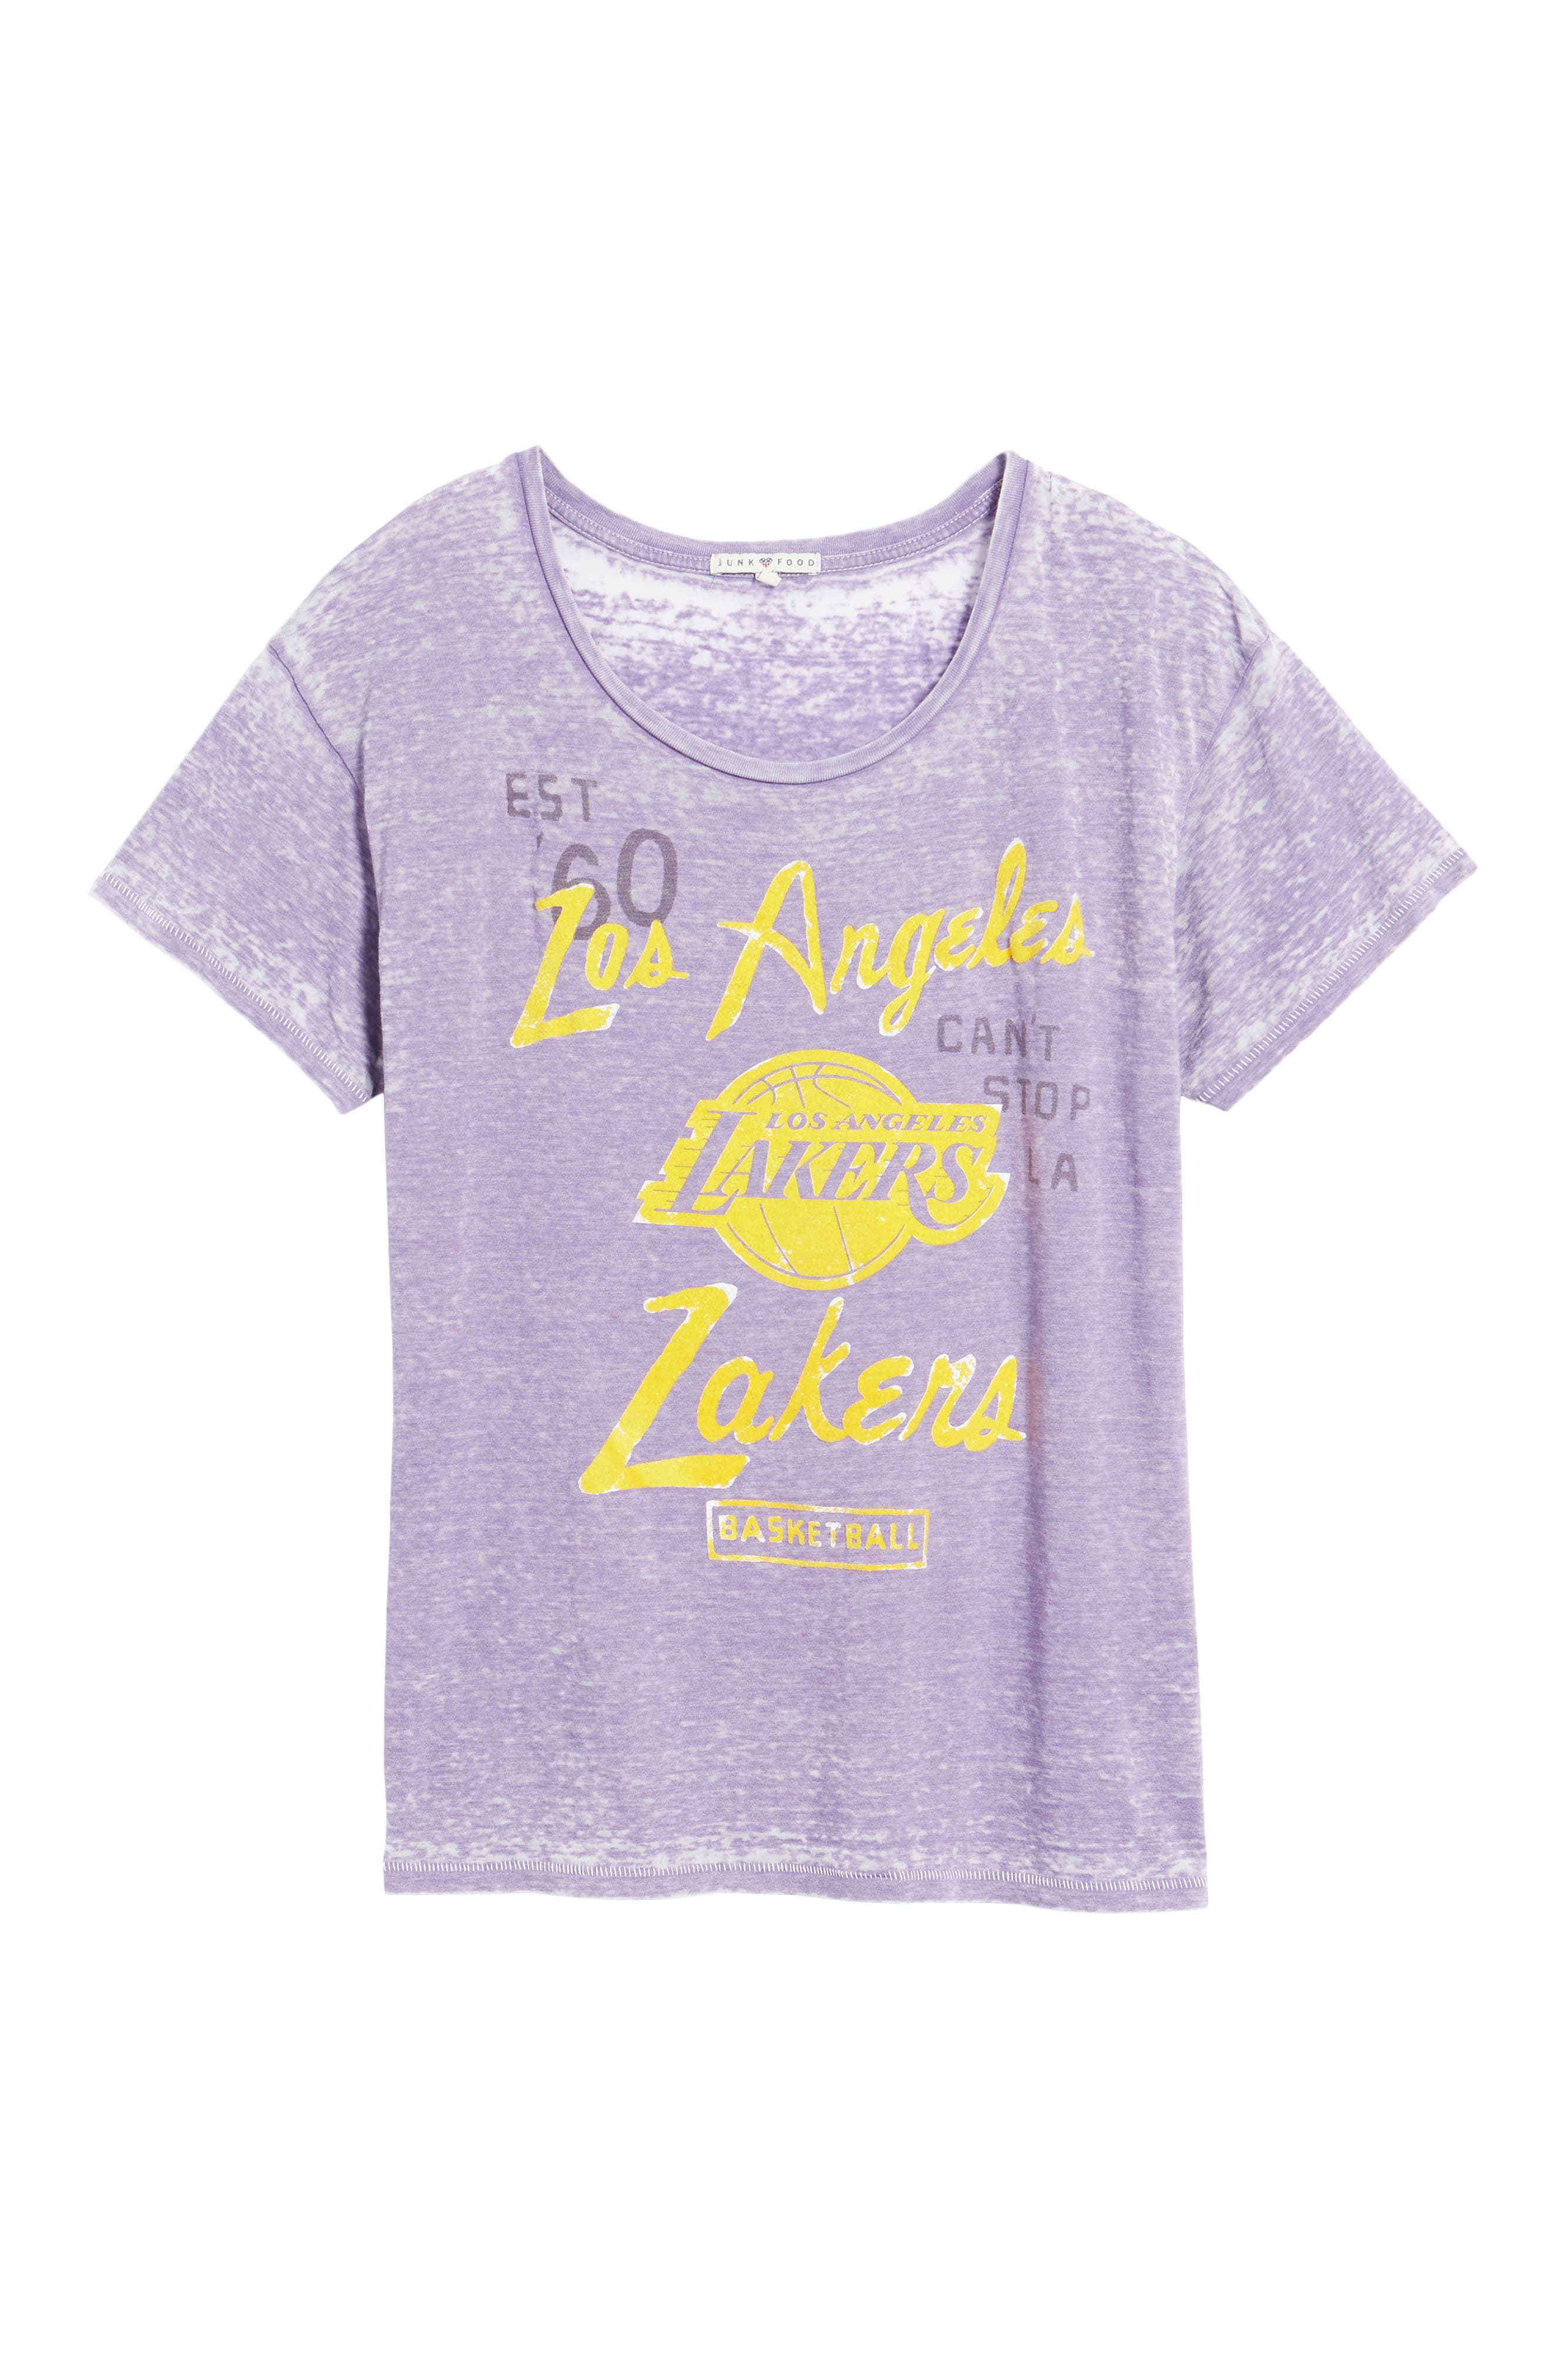 NBA Los Angeles Lakers Tee,                             Alternate thumbnail 6, color,                             Plum